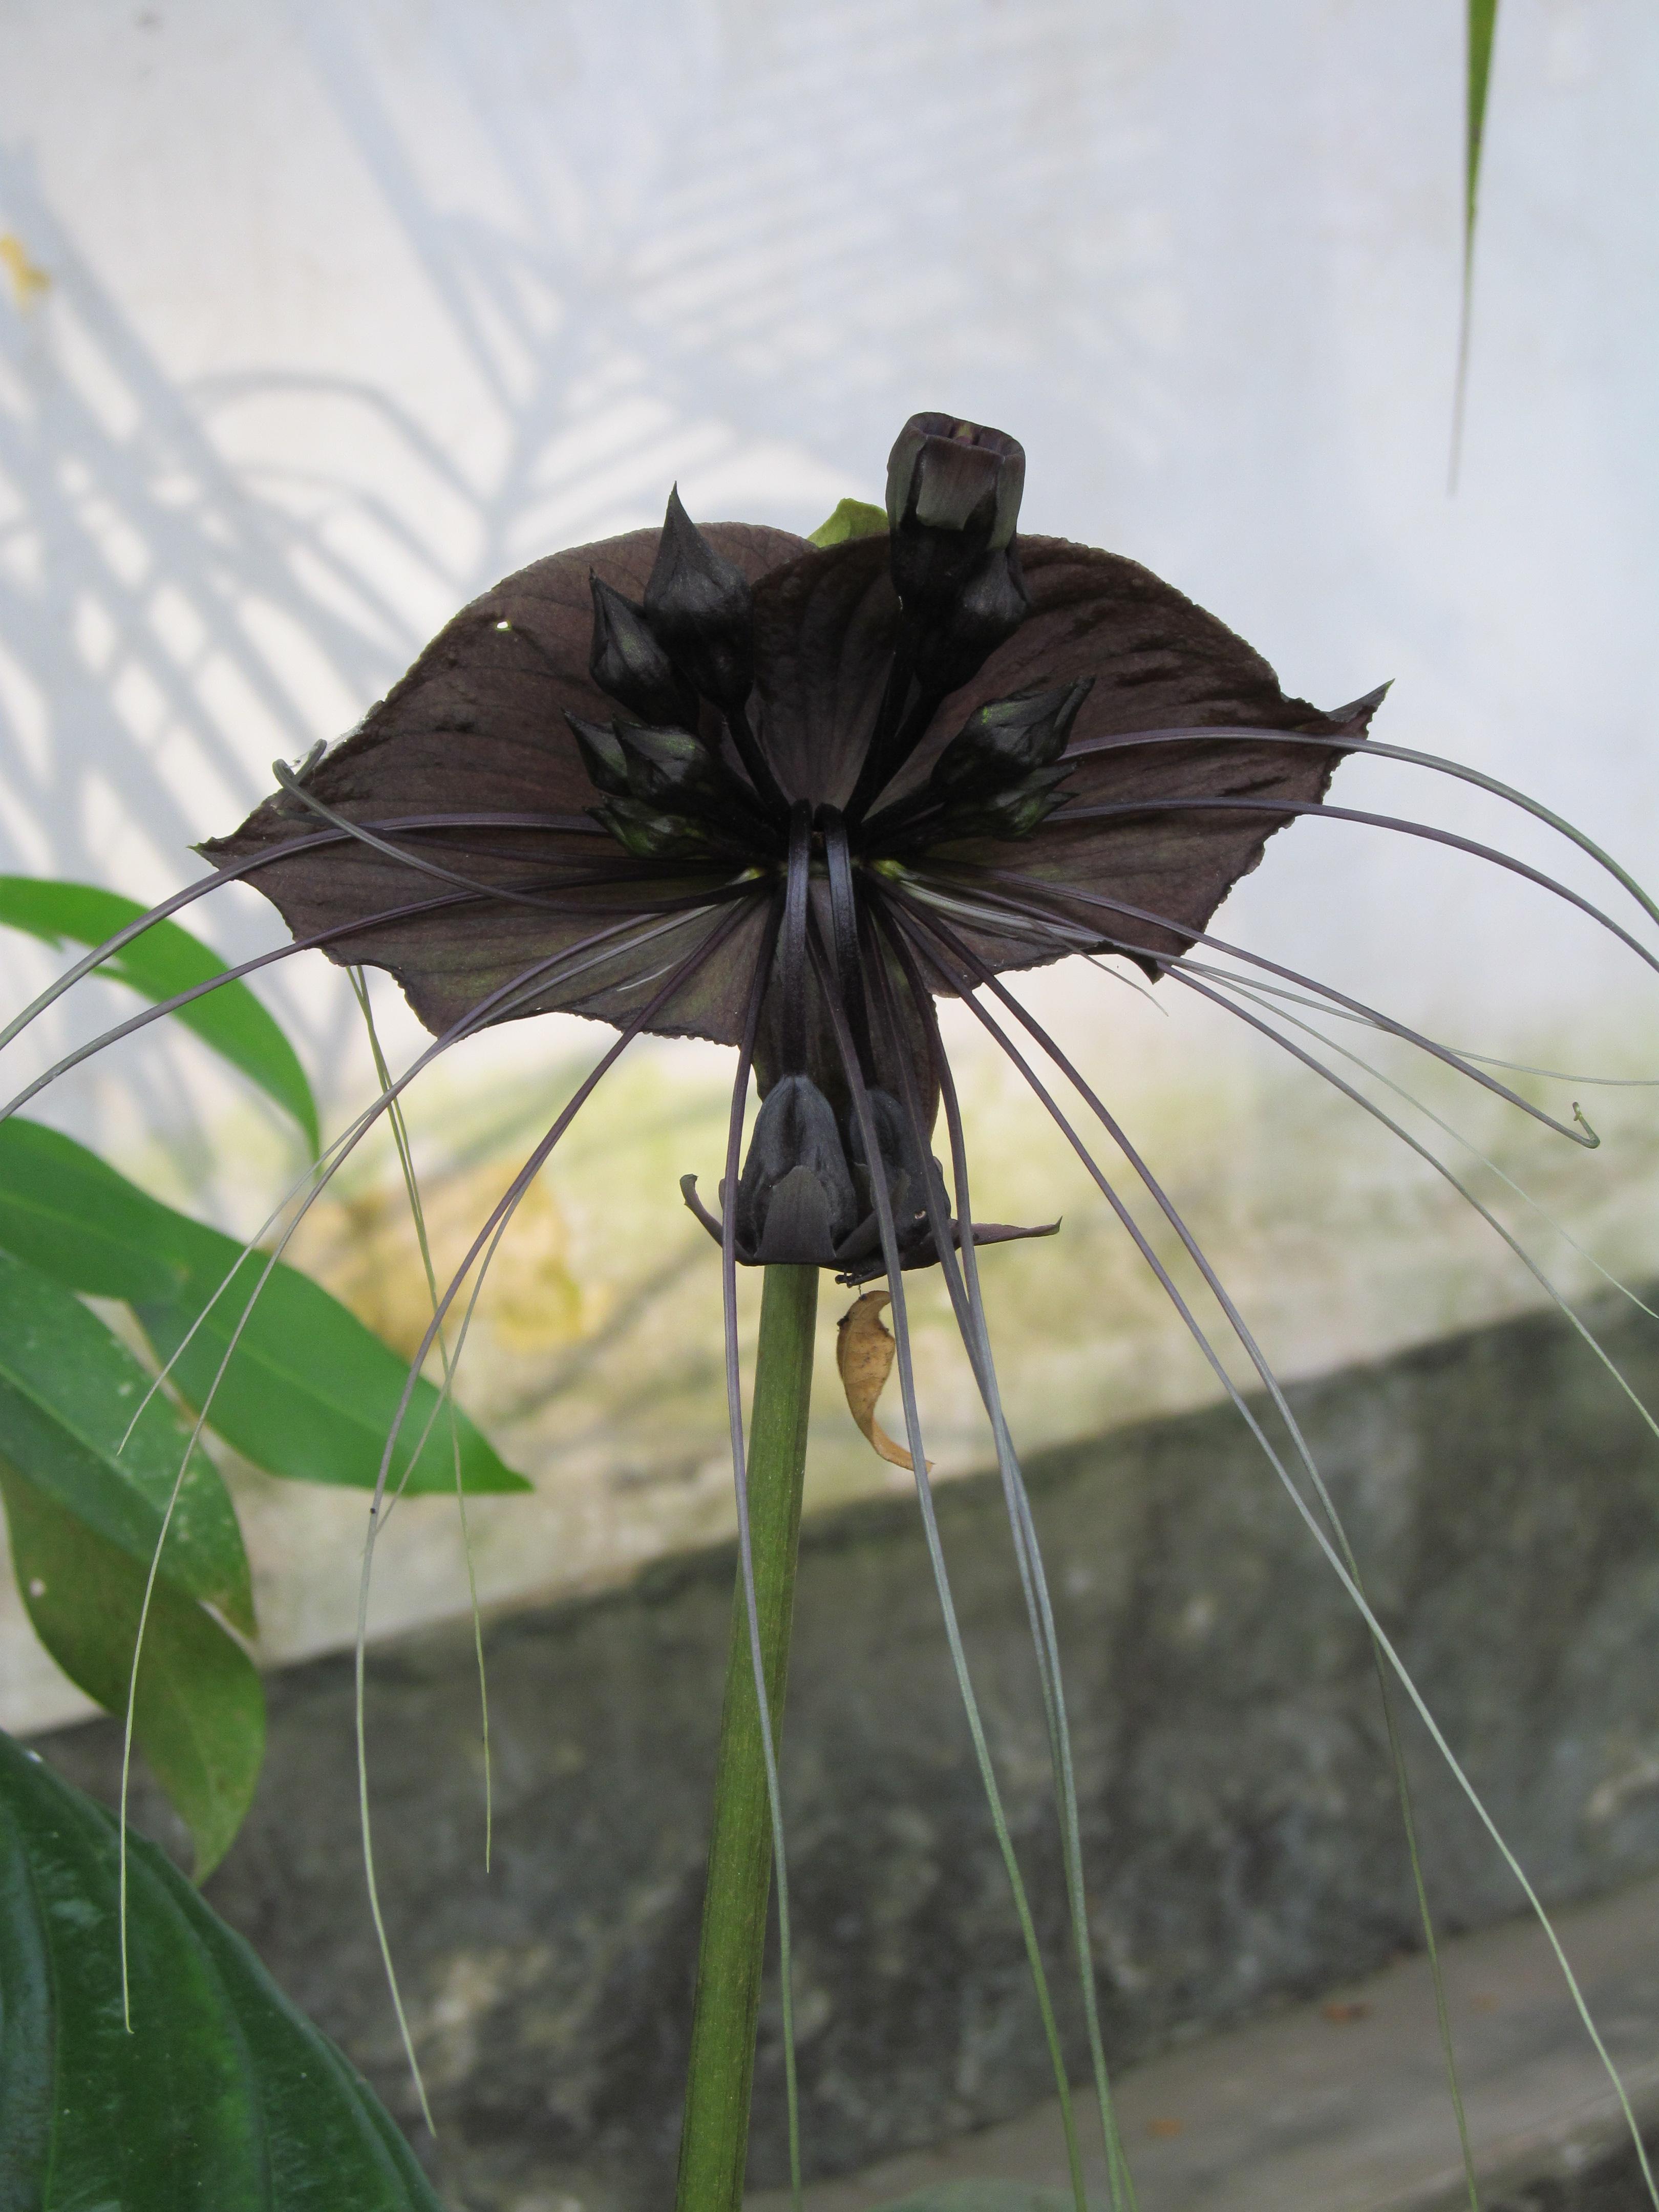 File Tacca chantrieri Kerala Vavvalpoovu black bat flower 01 JPG Wikime